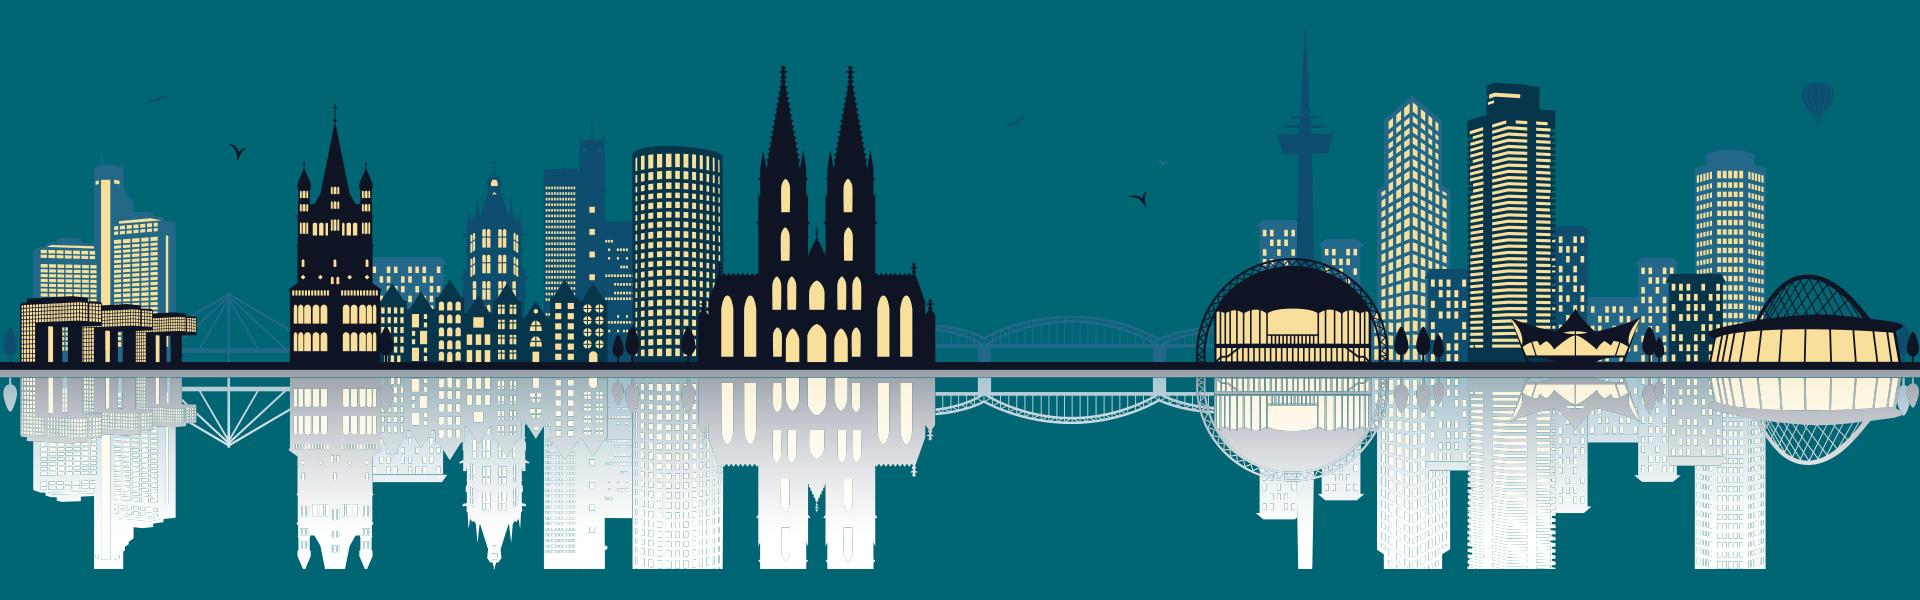 Headerbild Köln Guide - Panorama Köln